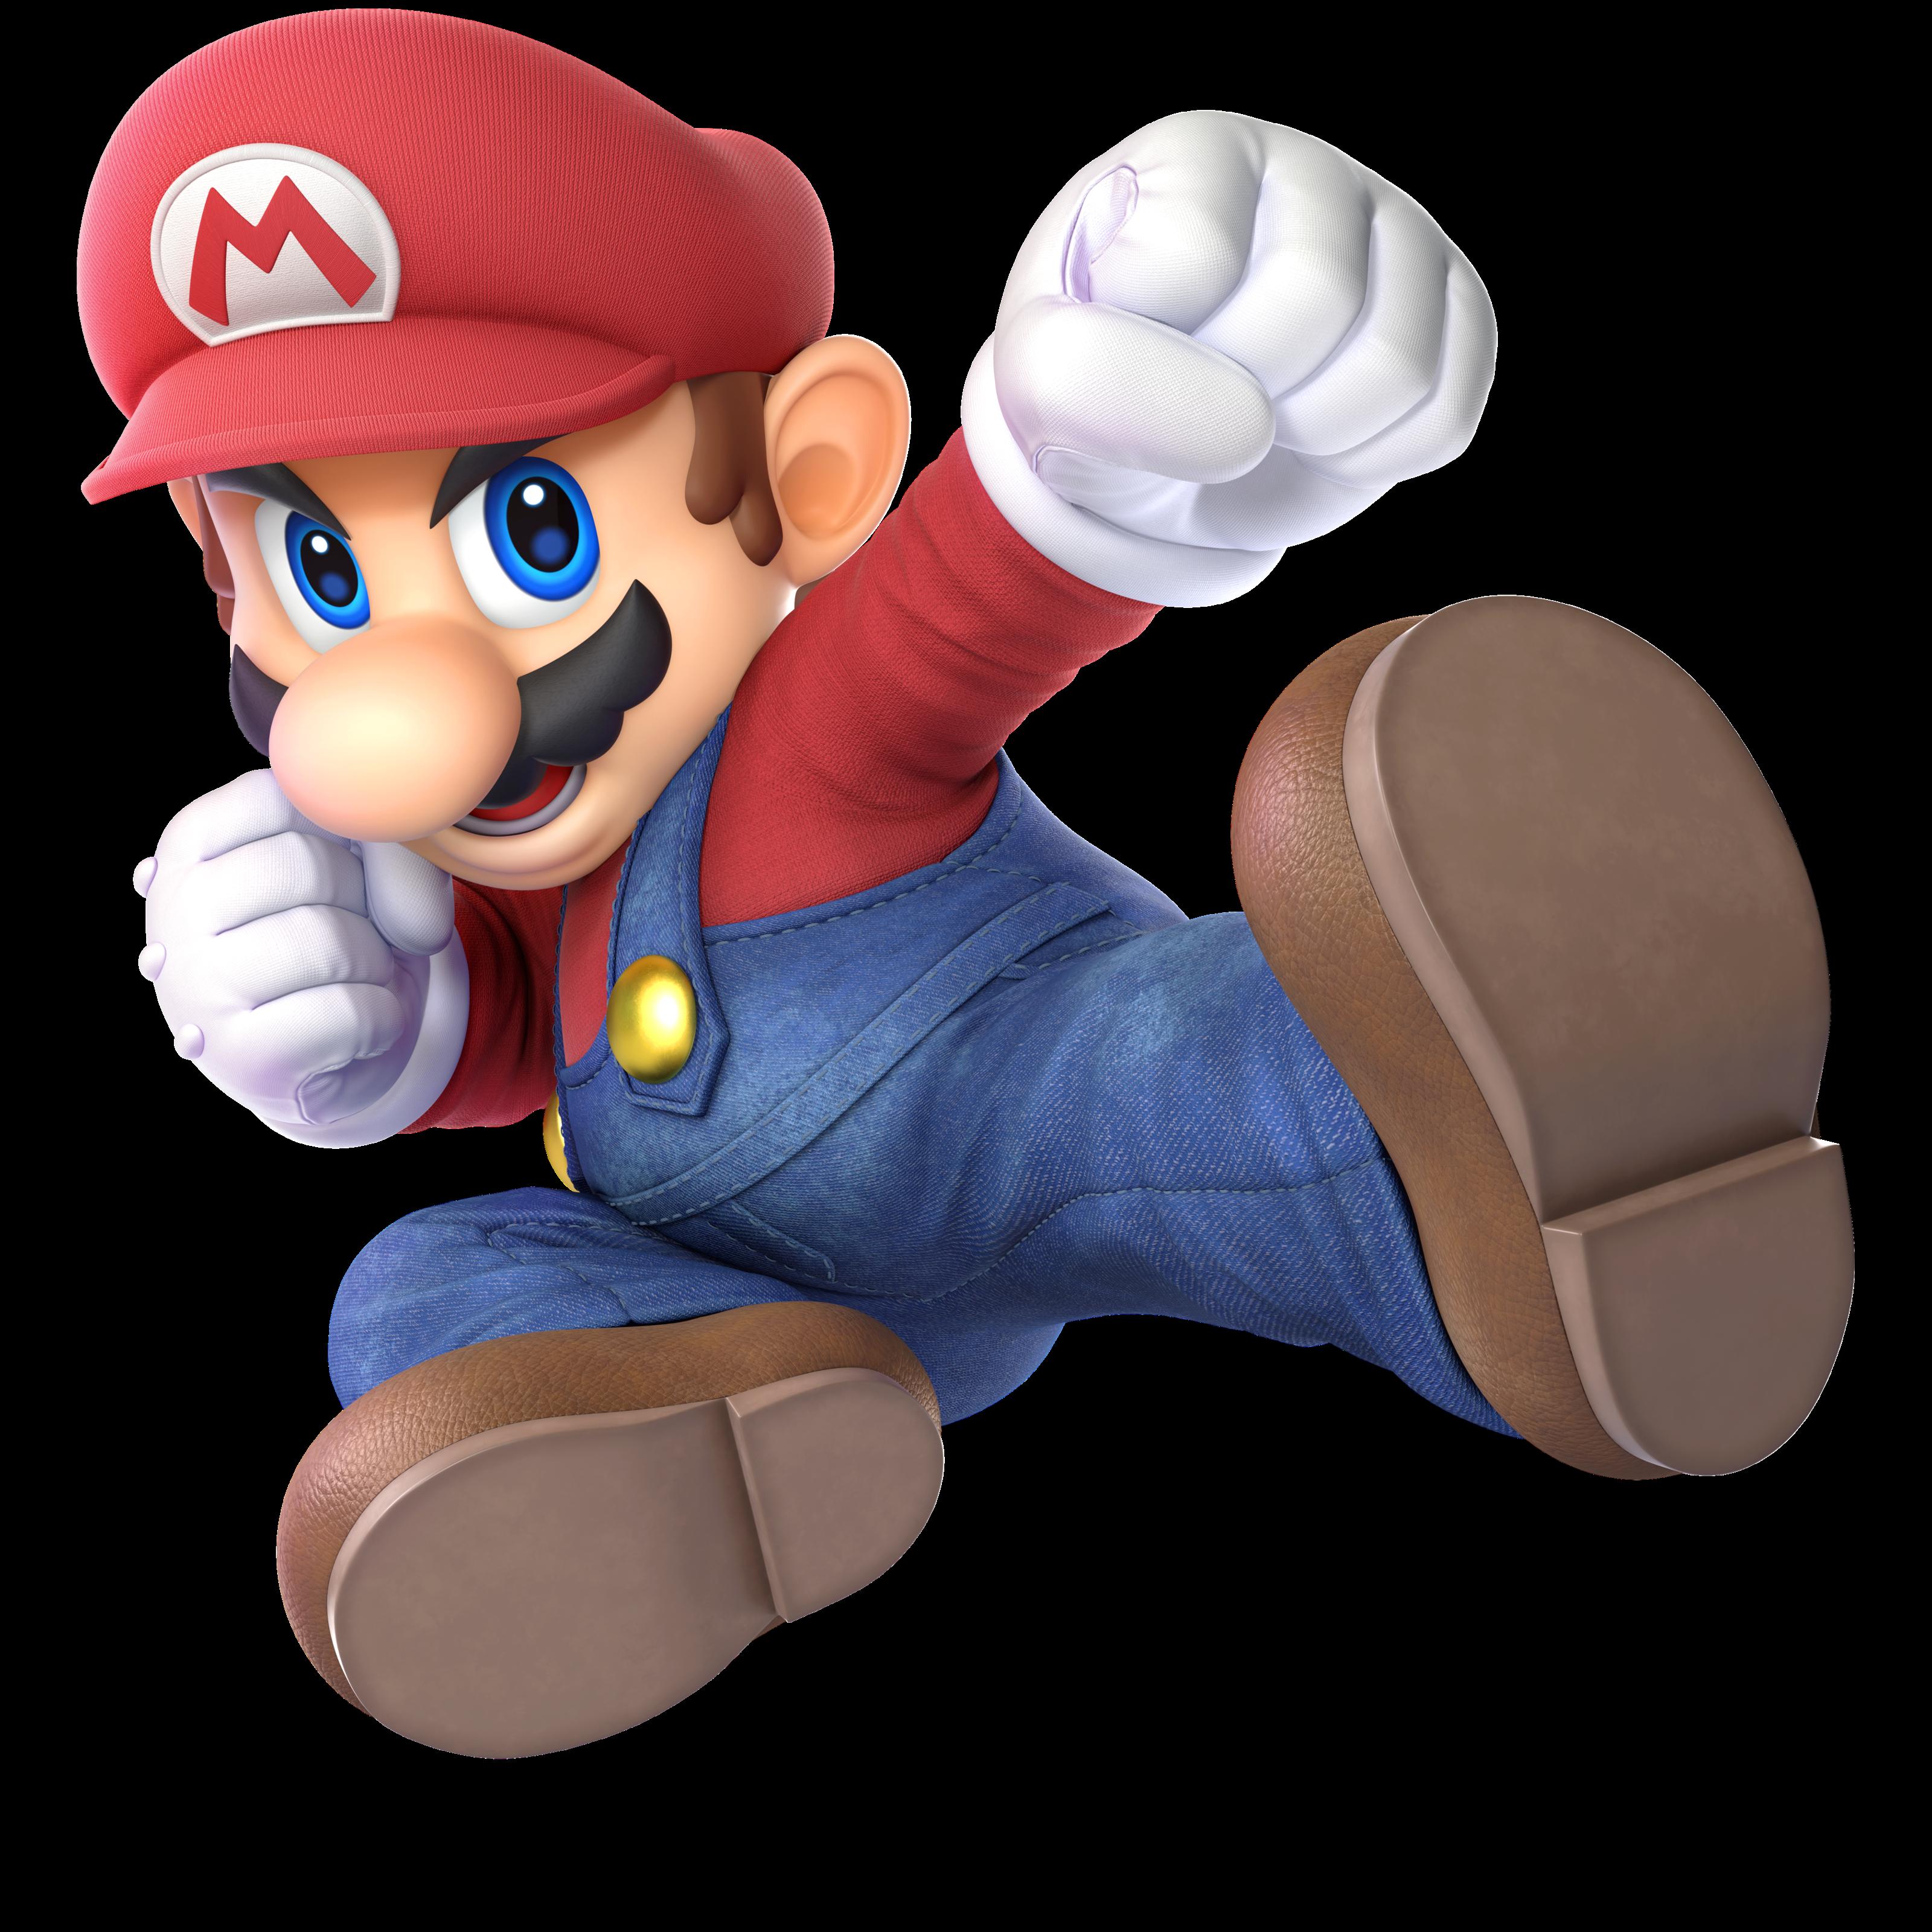 Billy's Super Smash Bros. Ultimate